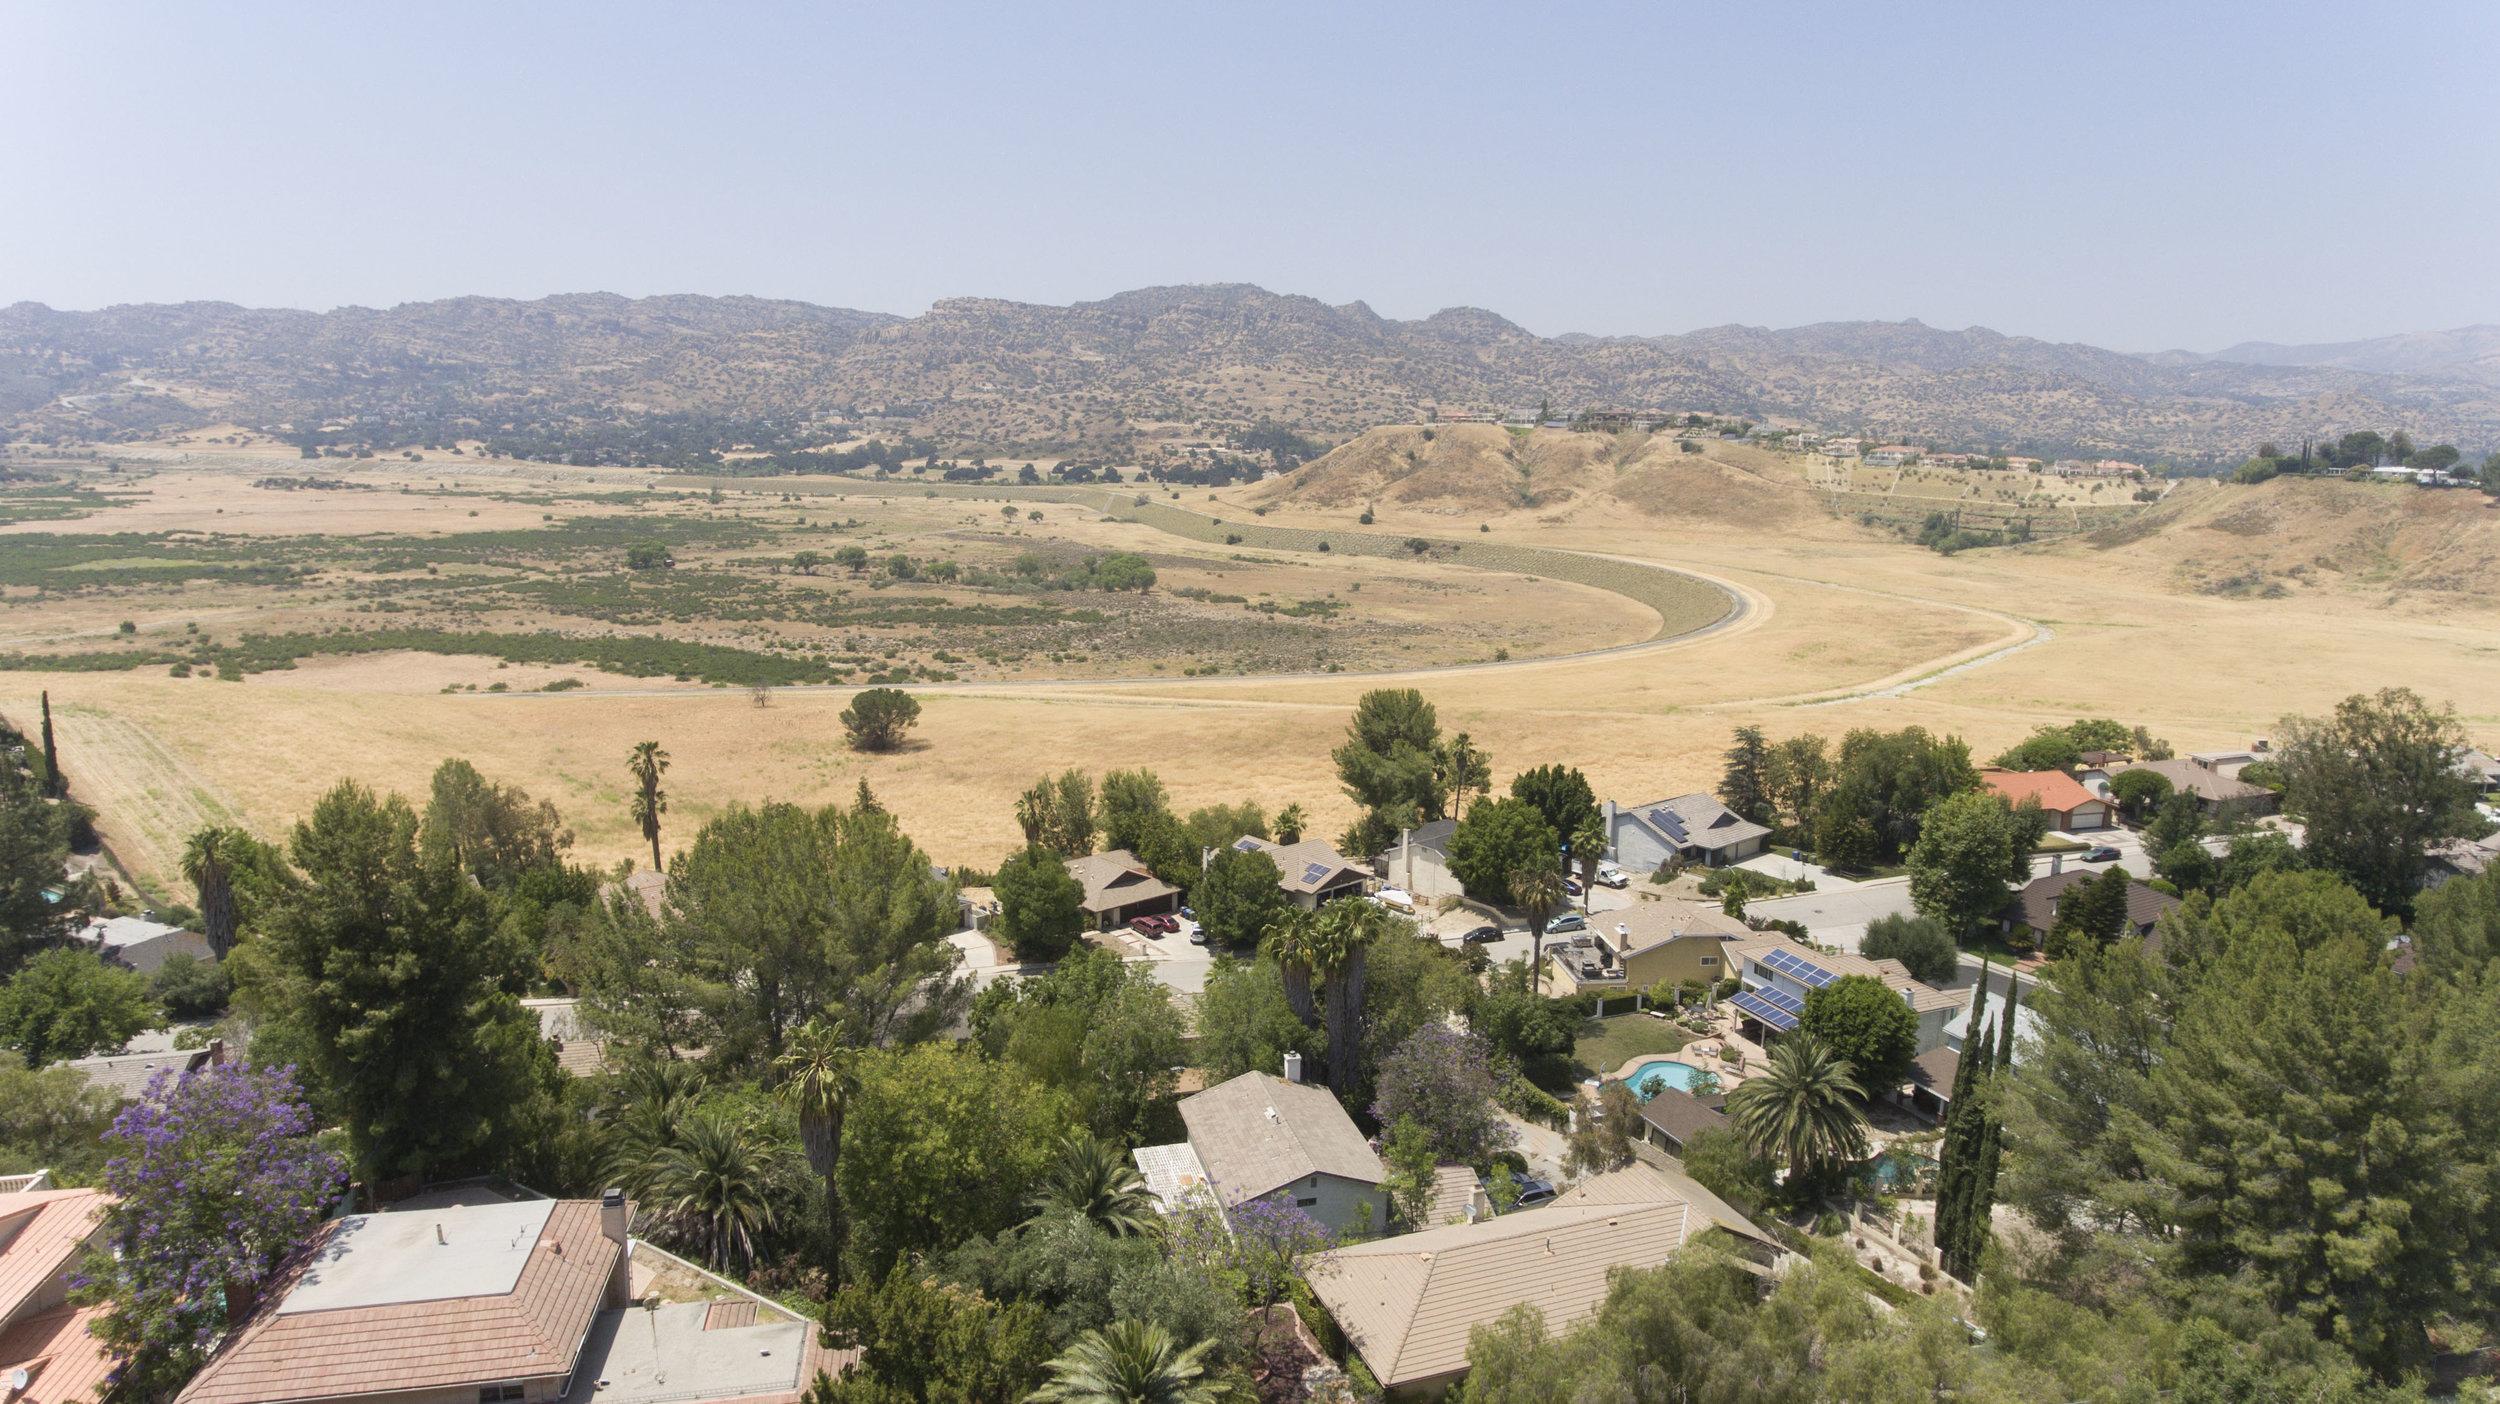 006 aerial 8832 Moorcroft Avenue West Hills For Sale Lease The Malibu Life Team Luxury Real Estate.jpg